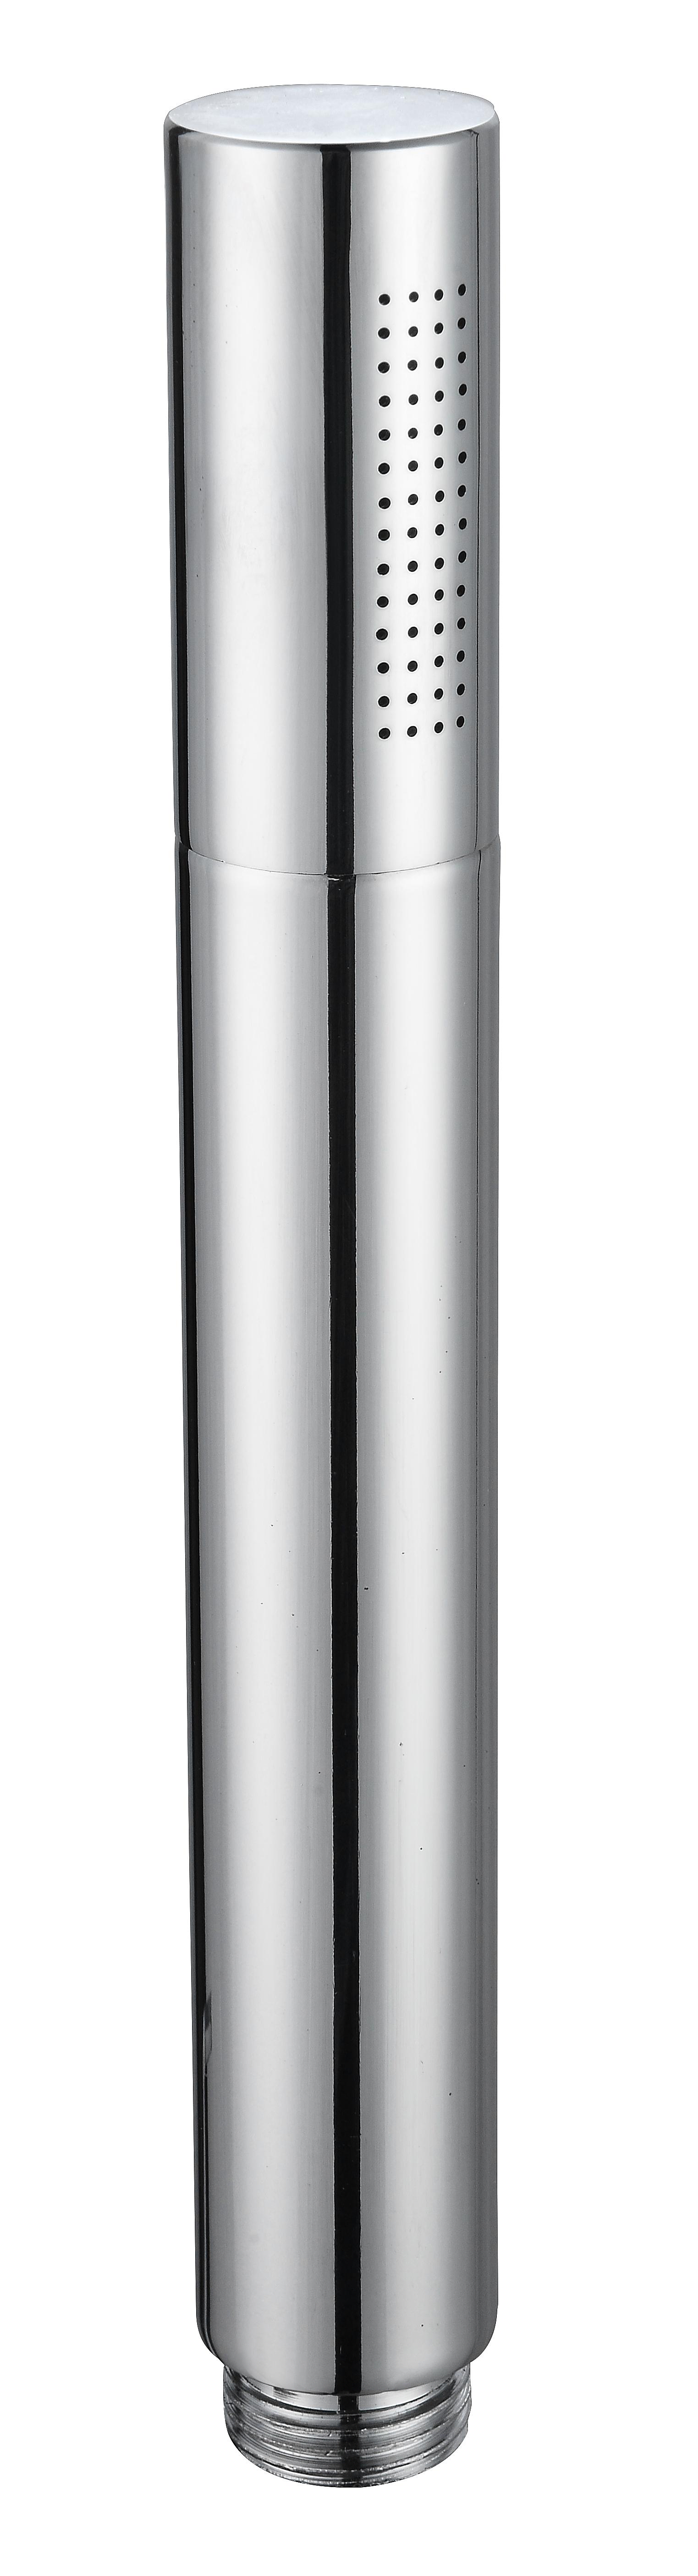 Messing - Handbrause HB-8366